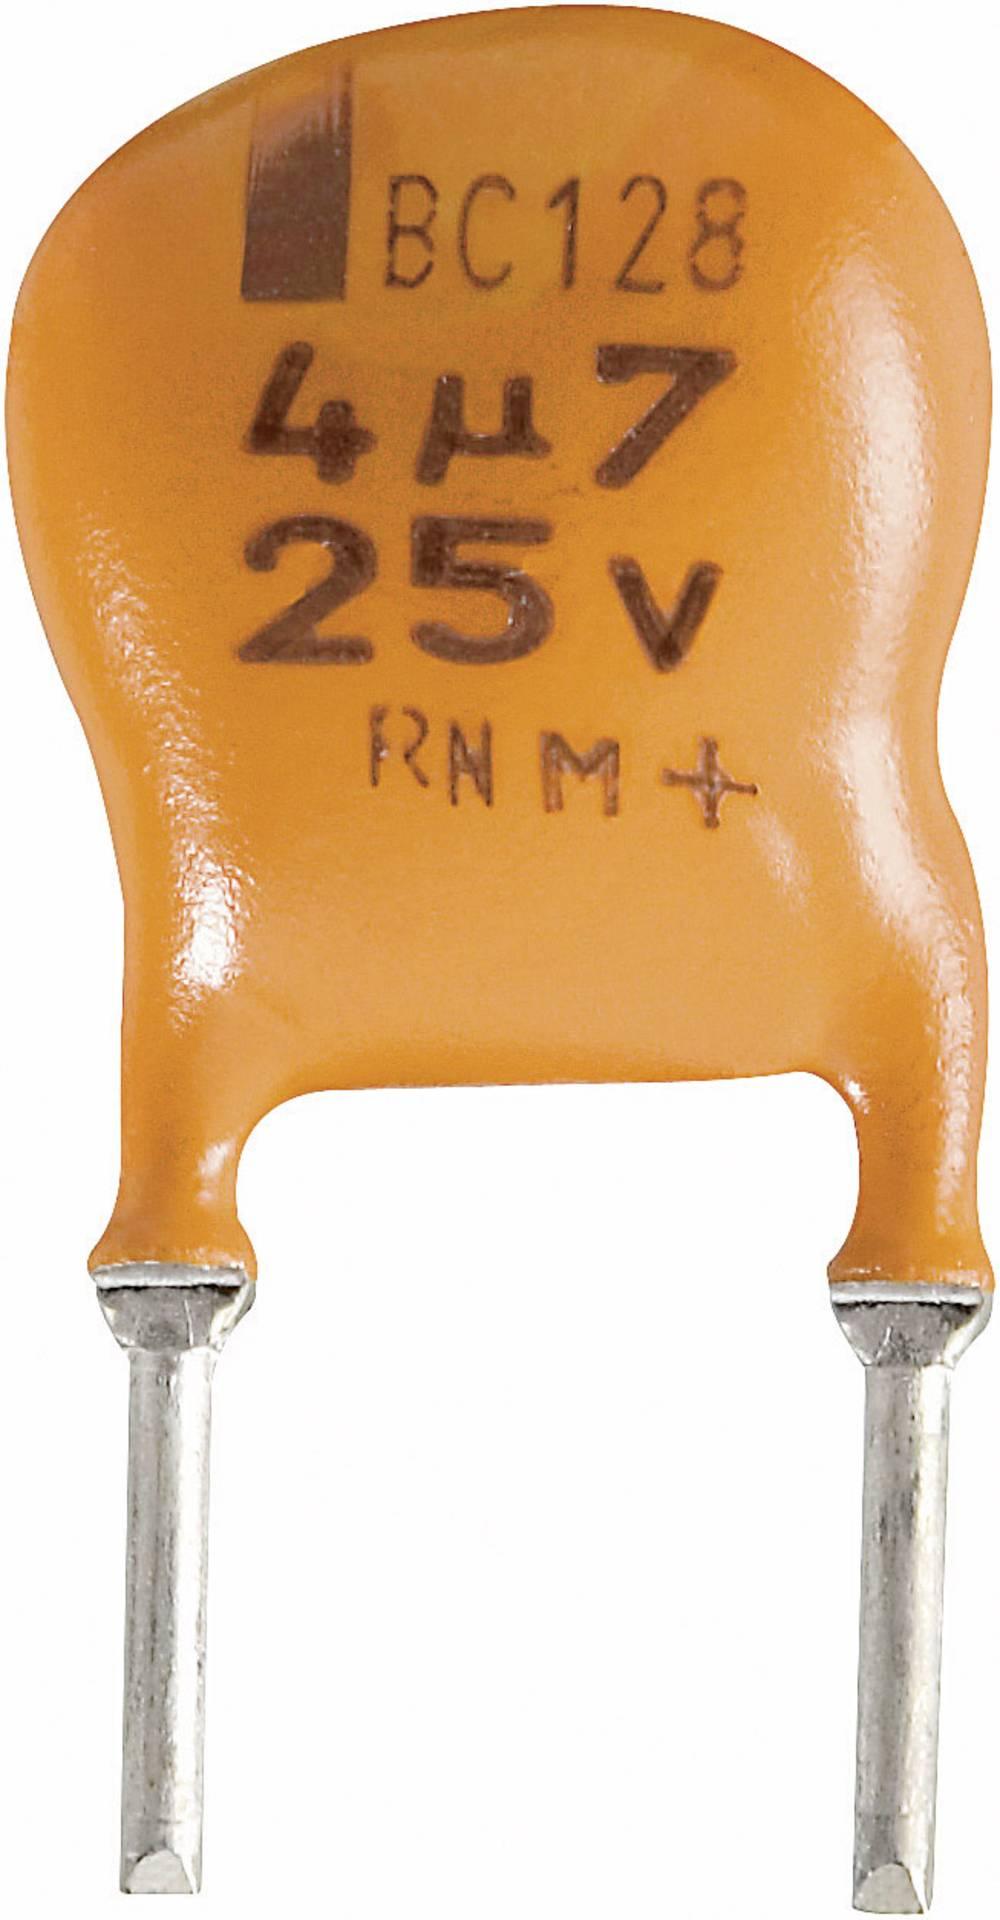 Vishay Radijalni kondenzator 128 2222 128 35228 (OxV) 10 mm x7 mm raster 5 mm 2.2F 16 V